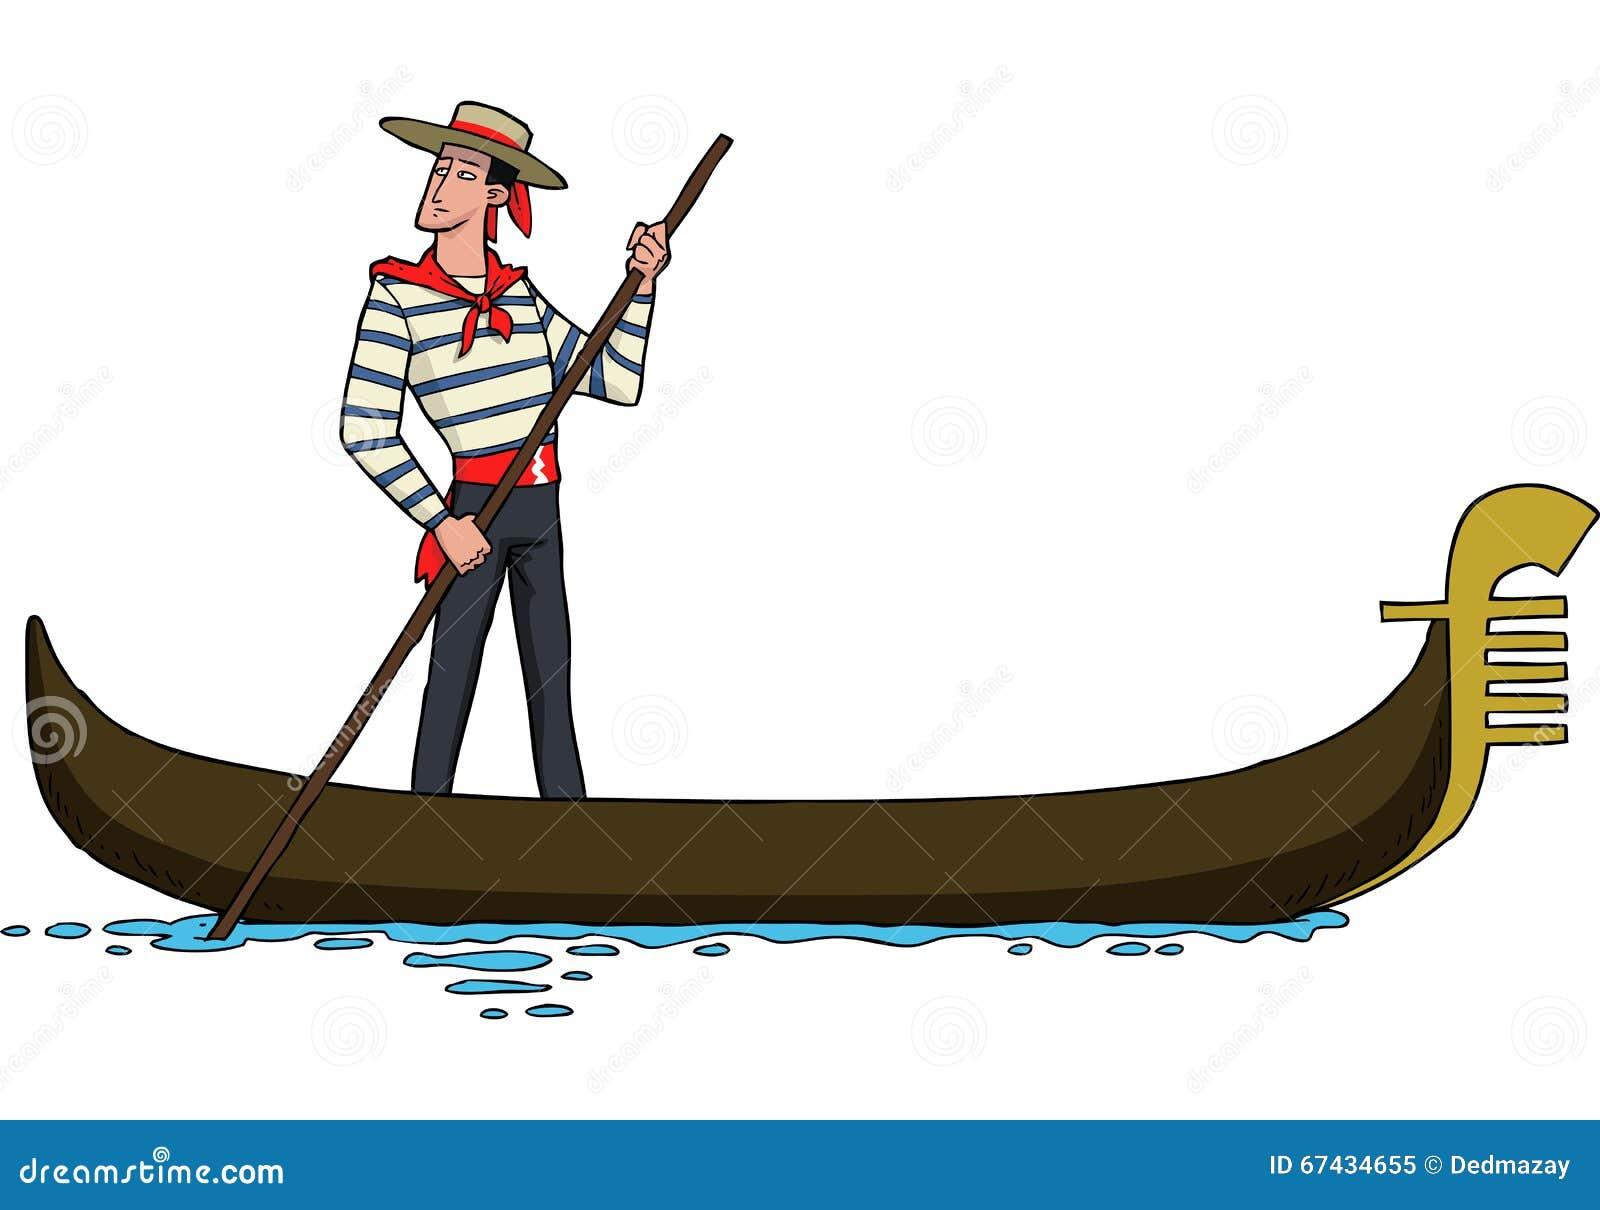 Gondolier on gondola stock vector. Illustration of design - 67434655